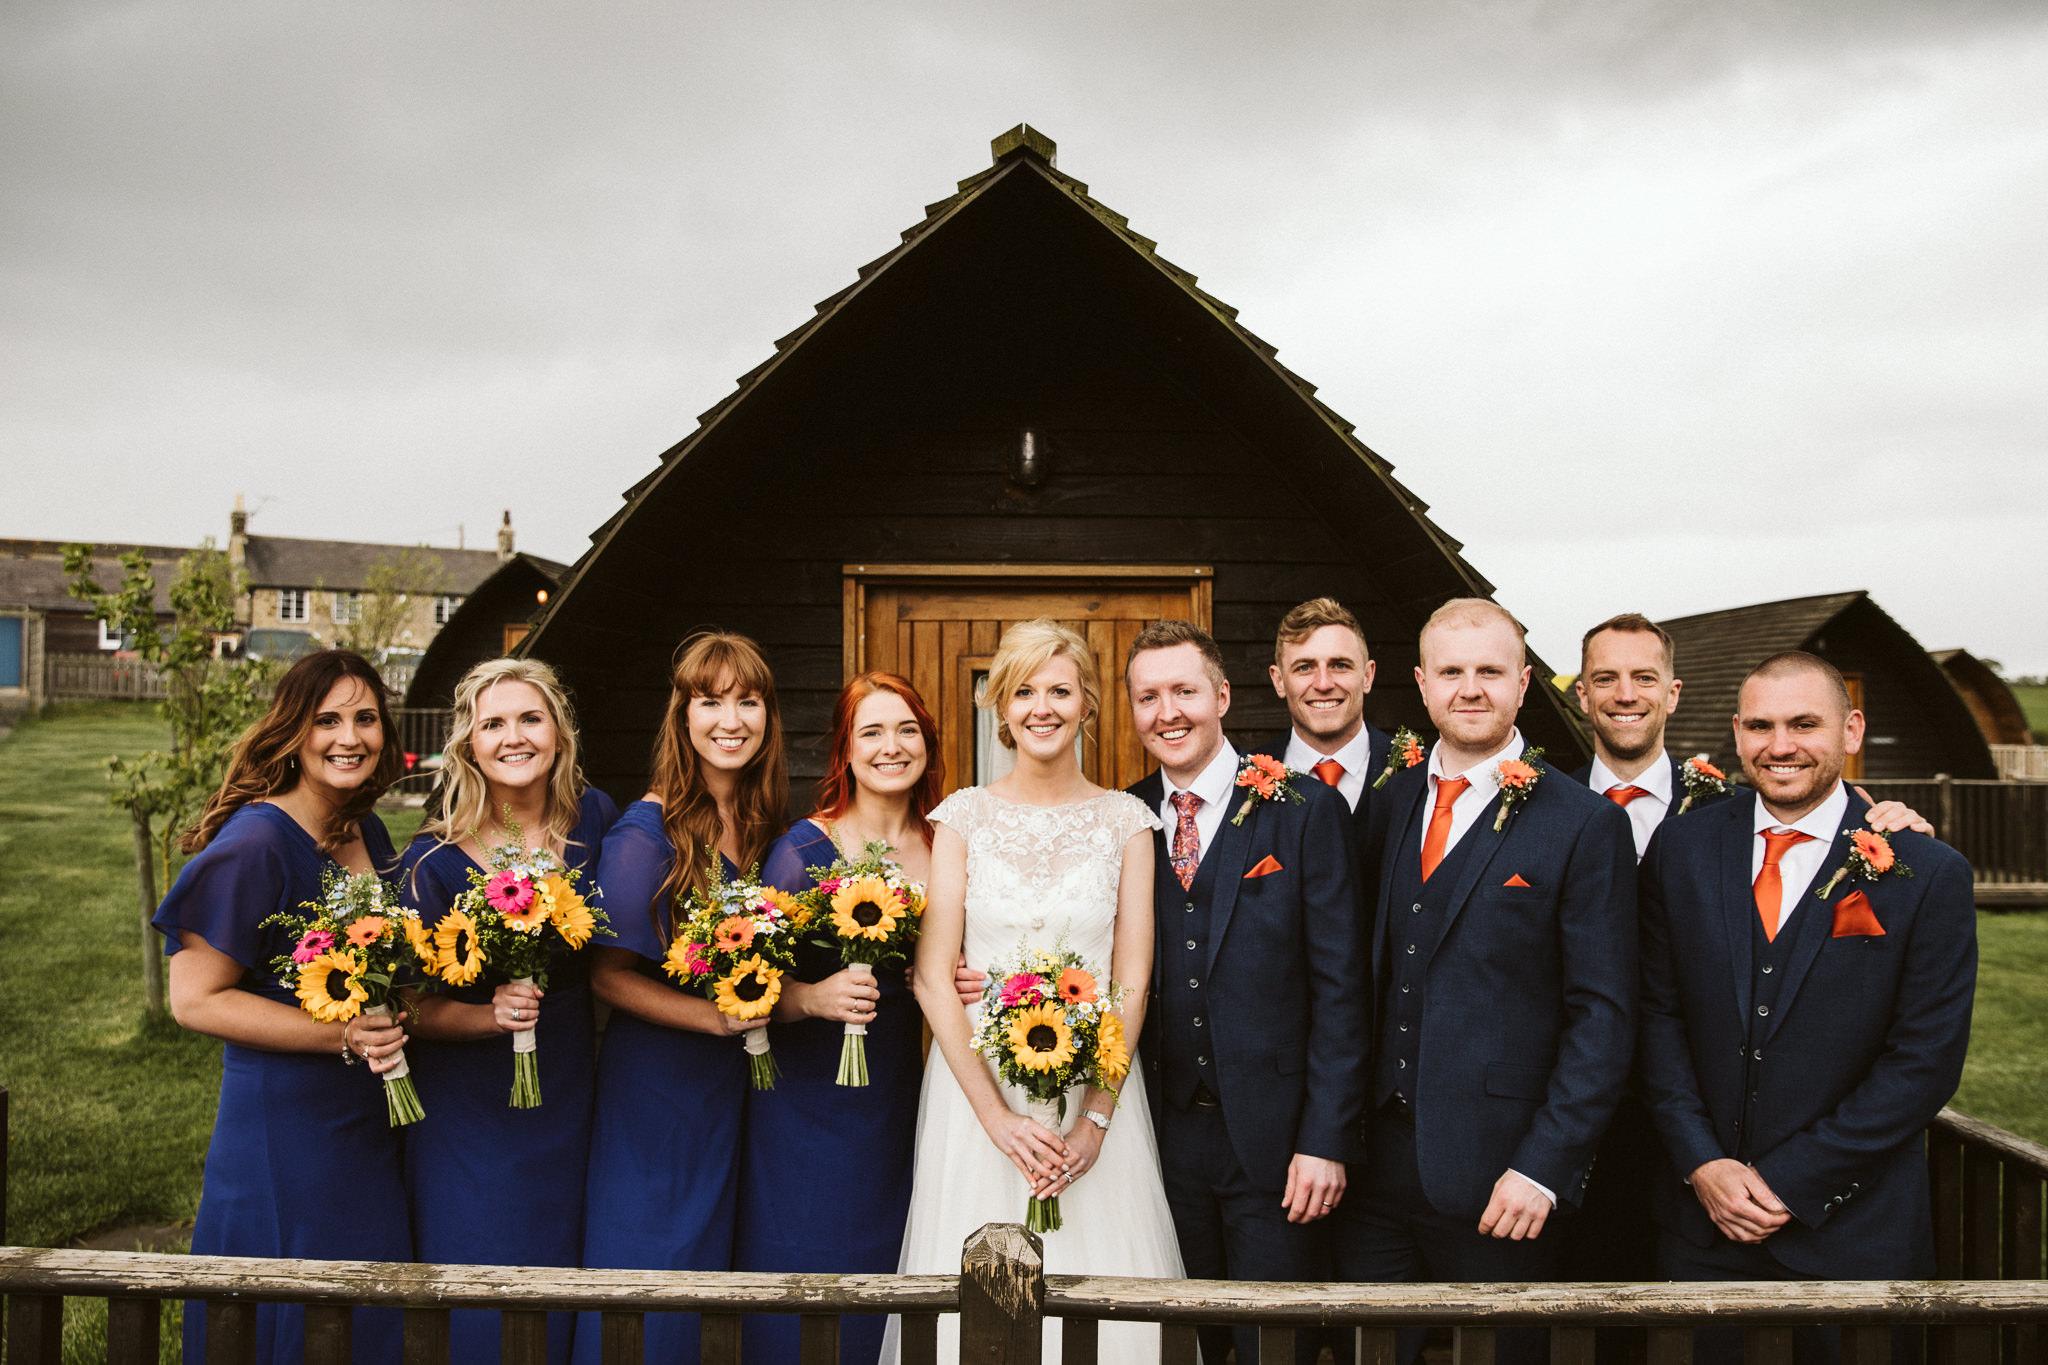 northside-farm-wedding-northumberland-margarita-hope (93).jpg